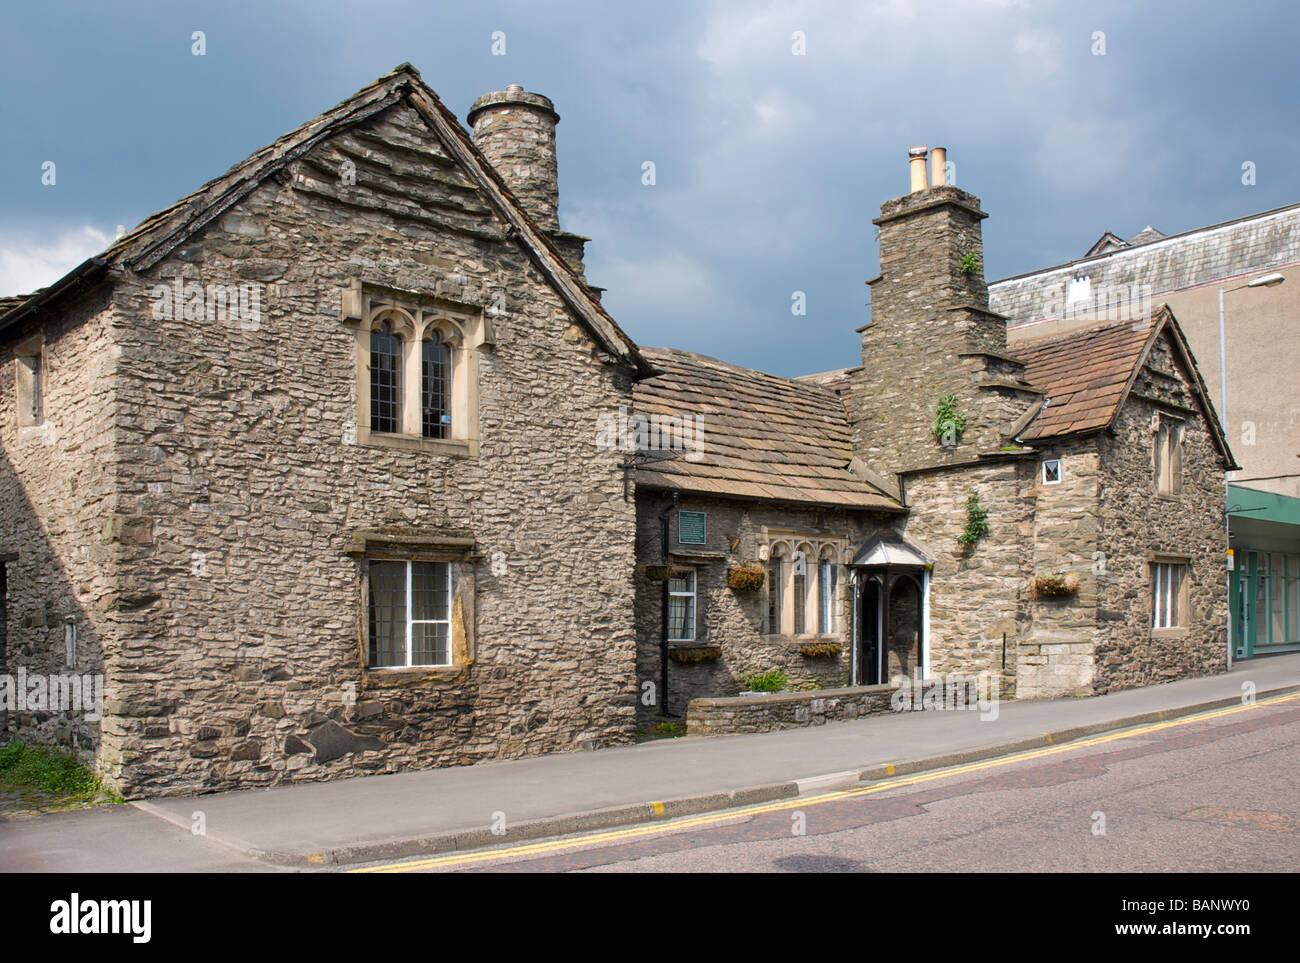 15th century Castle Dairy on Wildman Street, Kendal, Cumbria, England UK Stock Photo